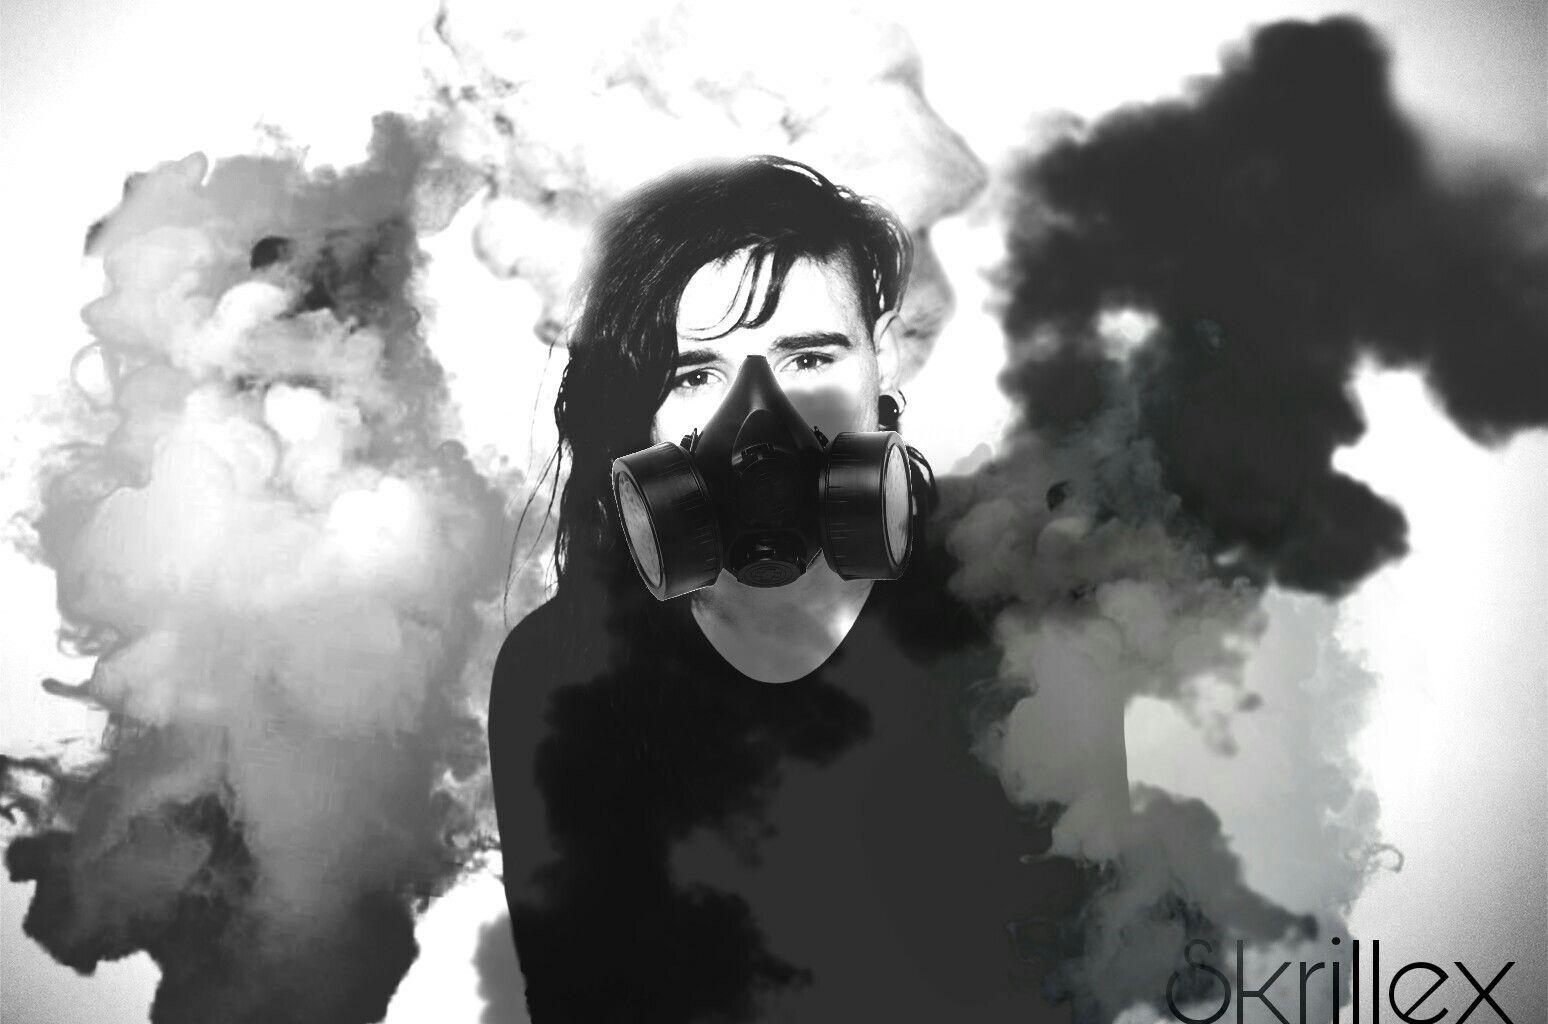 Gas Mask clipart skrillex Image skrillex smoke by FreeToEdit